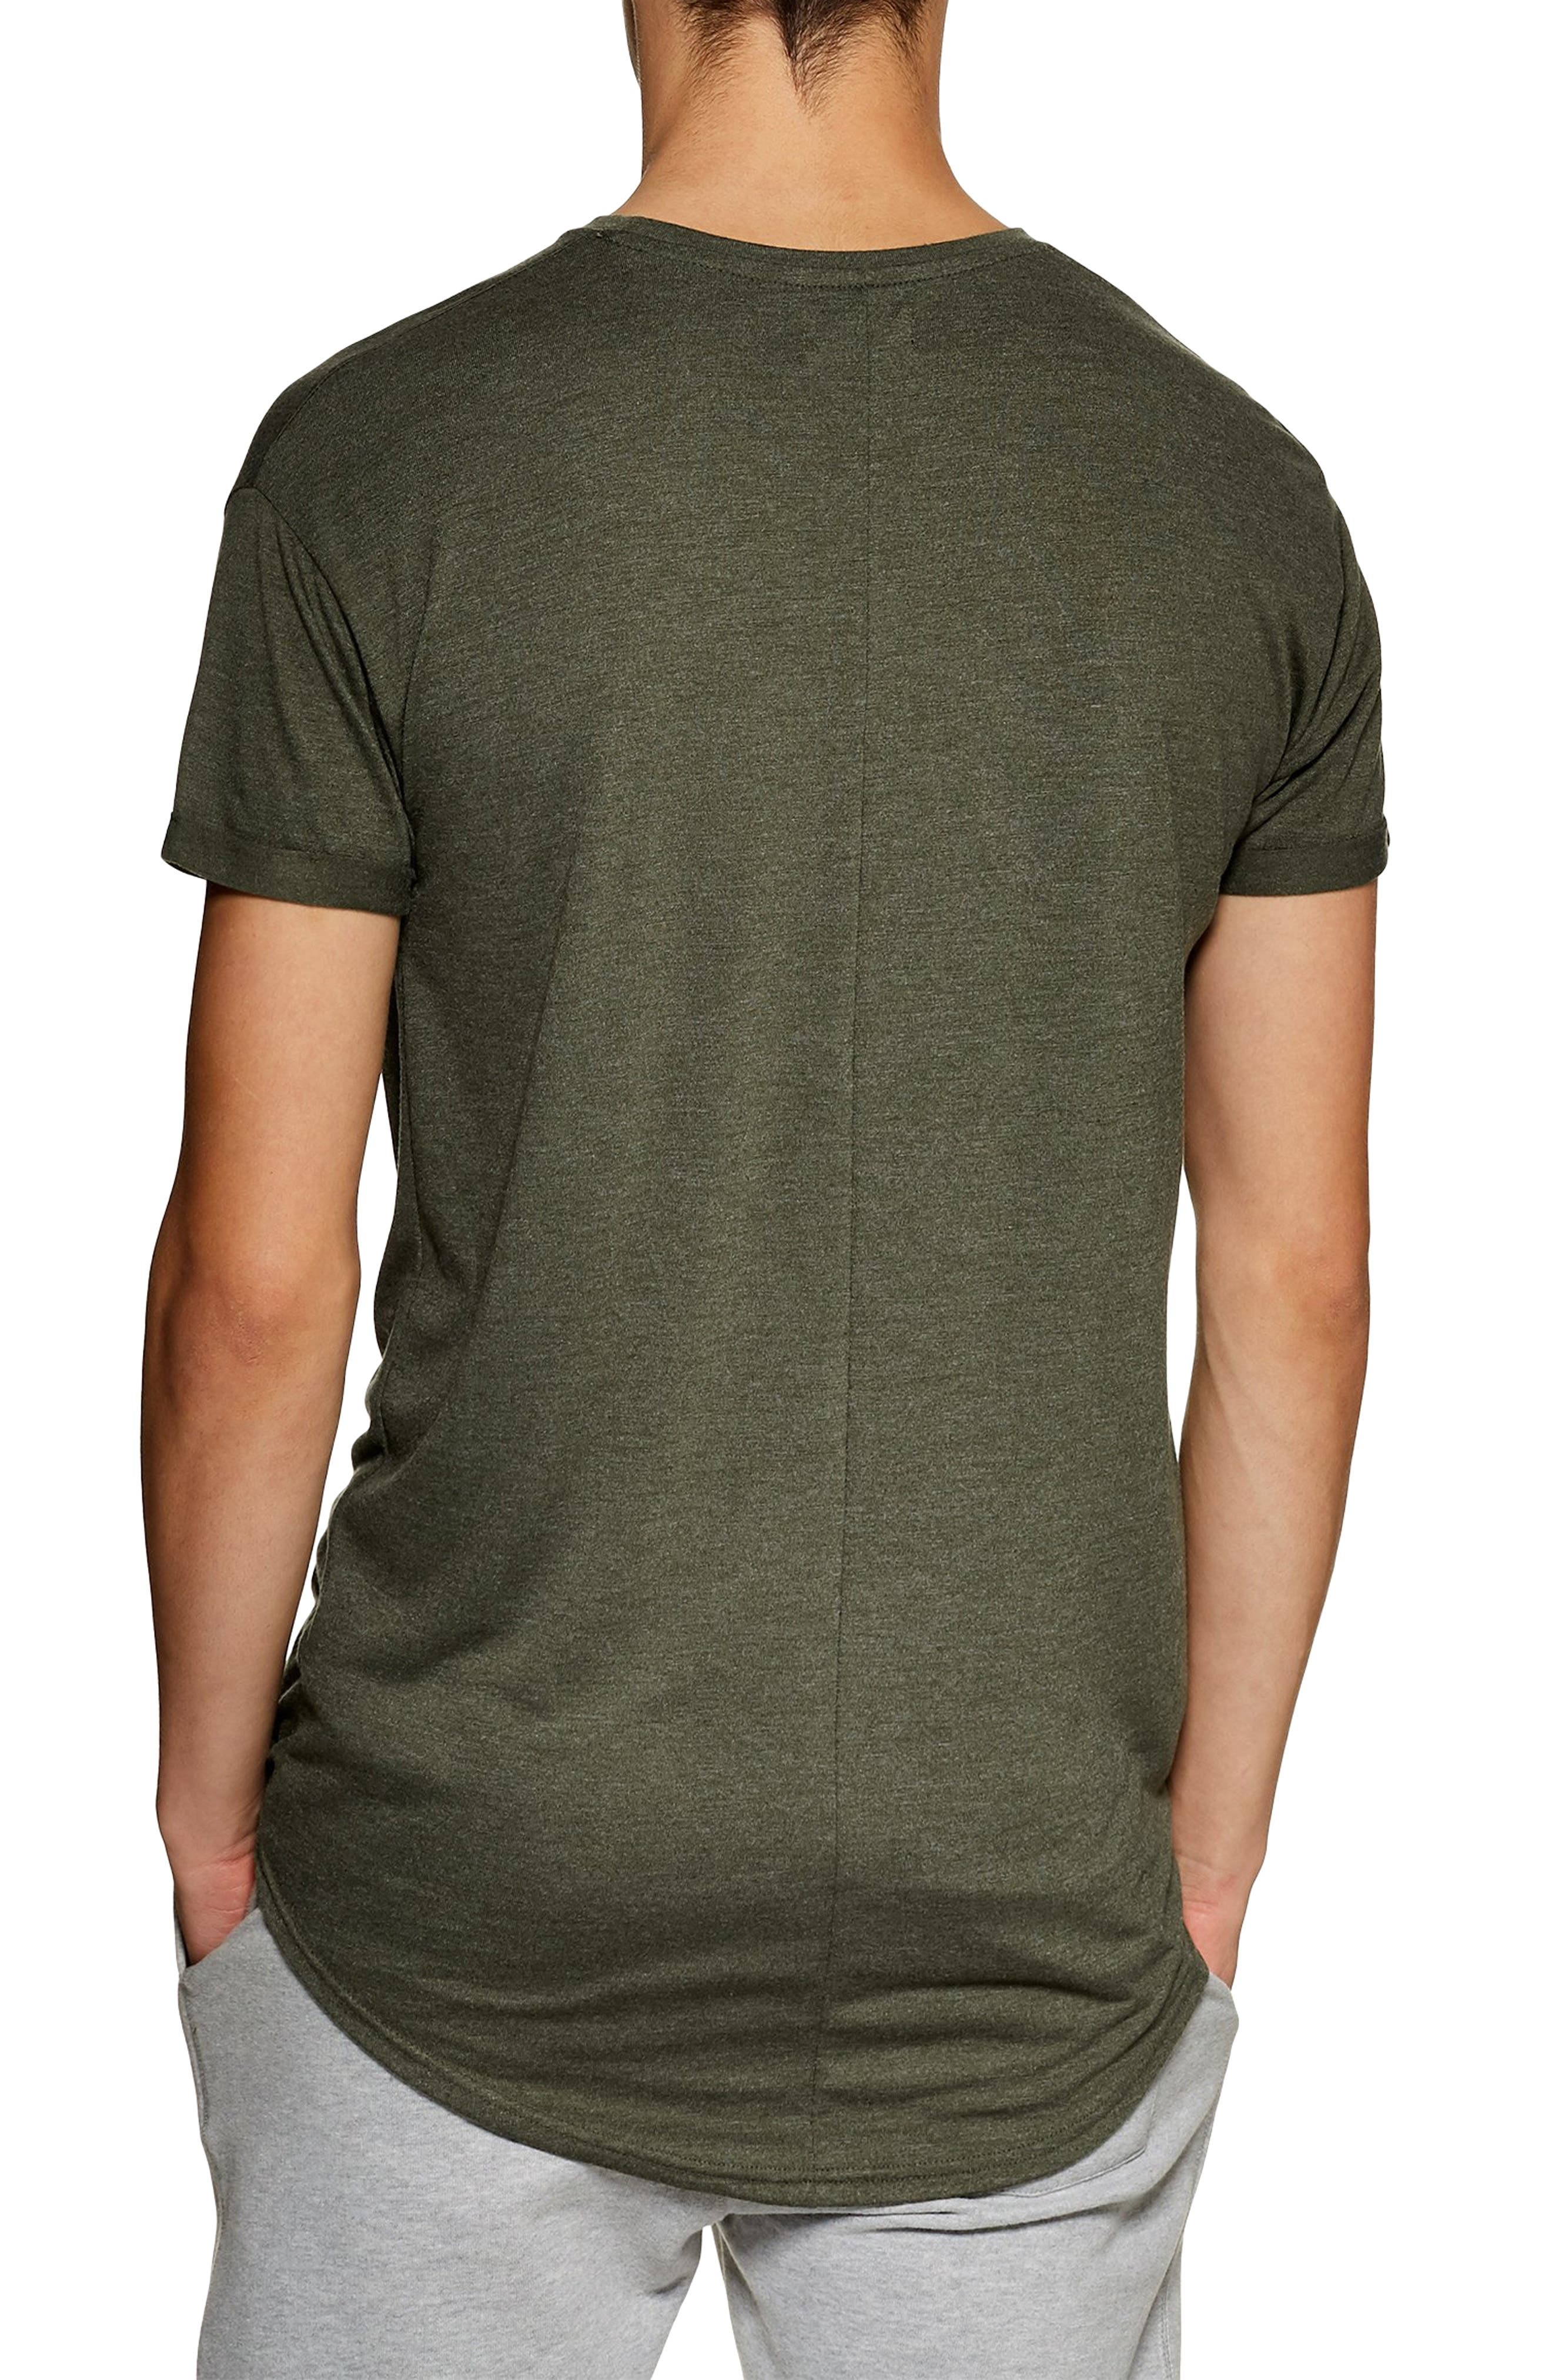 cbfa18cd30 Men s Topman T-Shirts